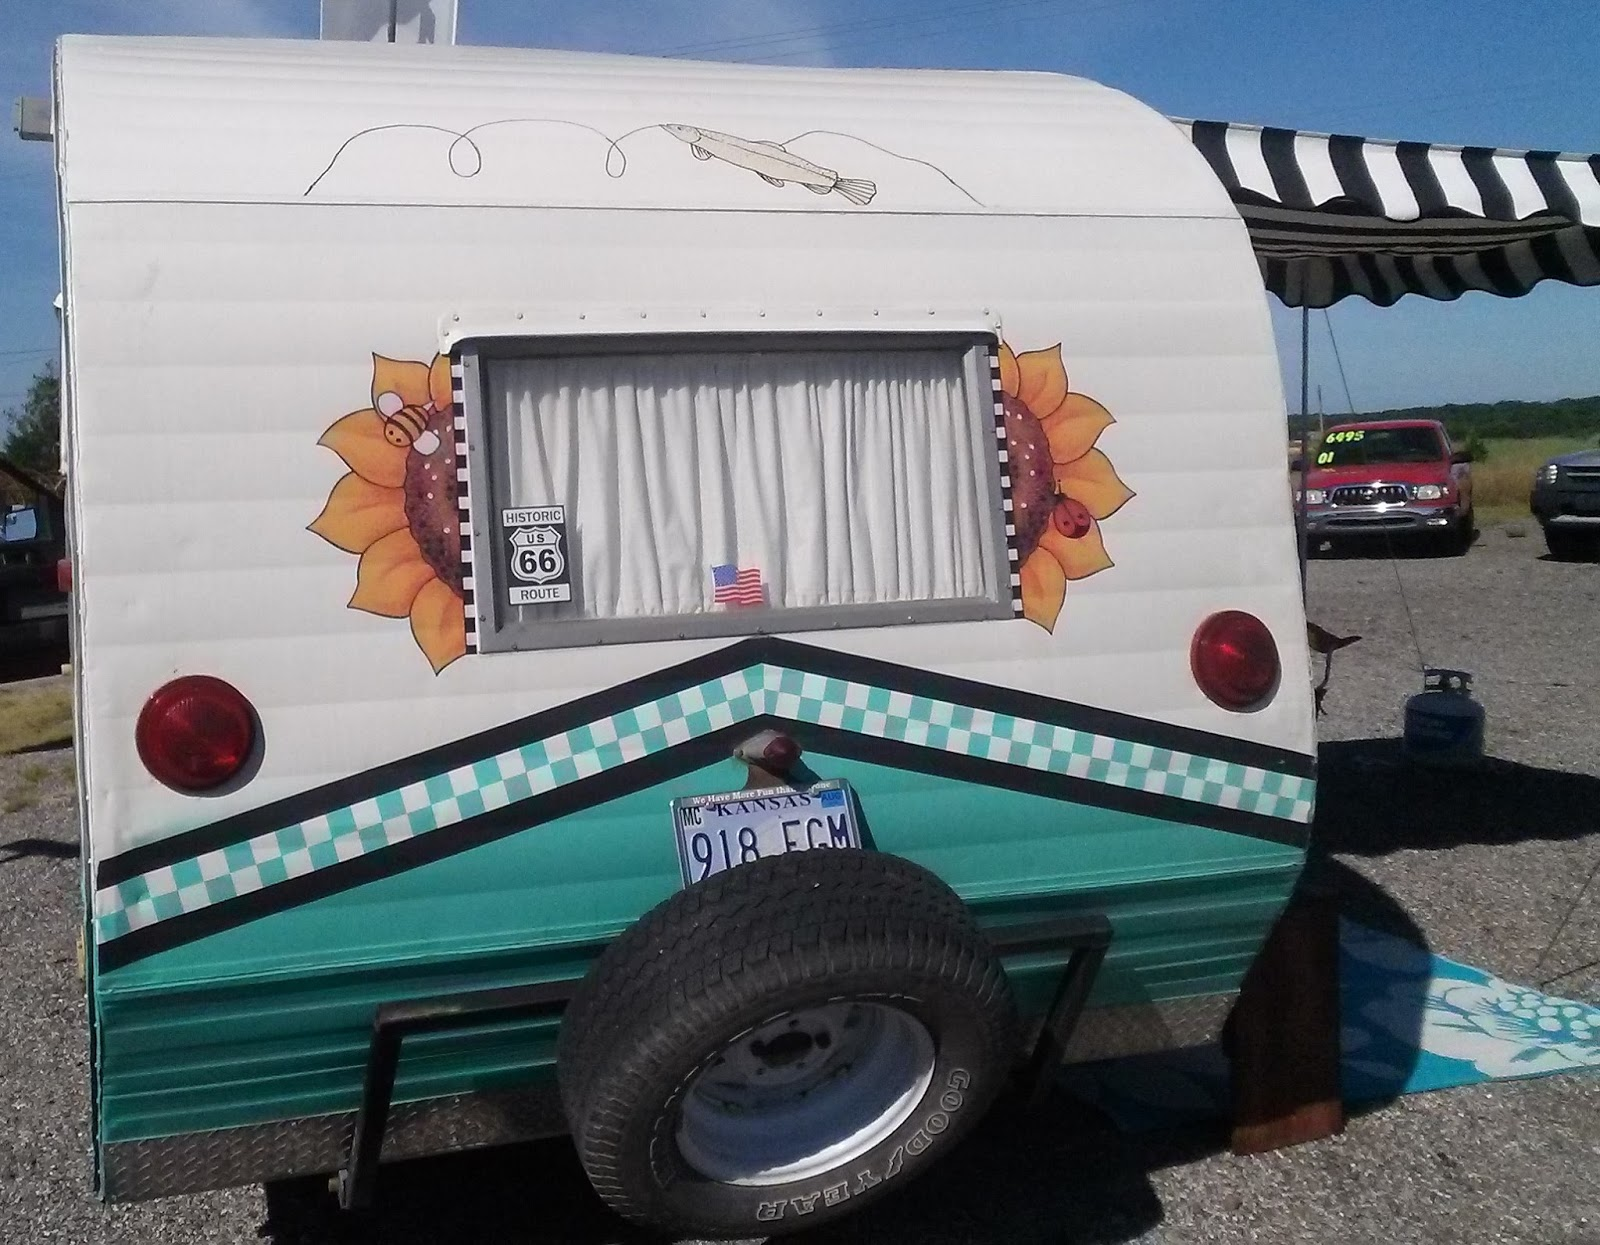 1961 Mobile Scout Rebuild Adventures: First Vintage Camper Related